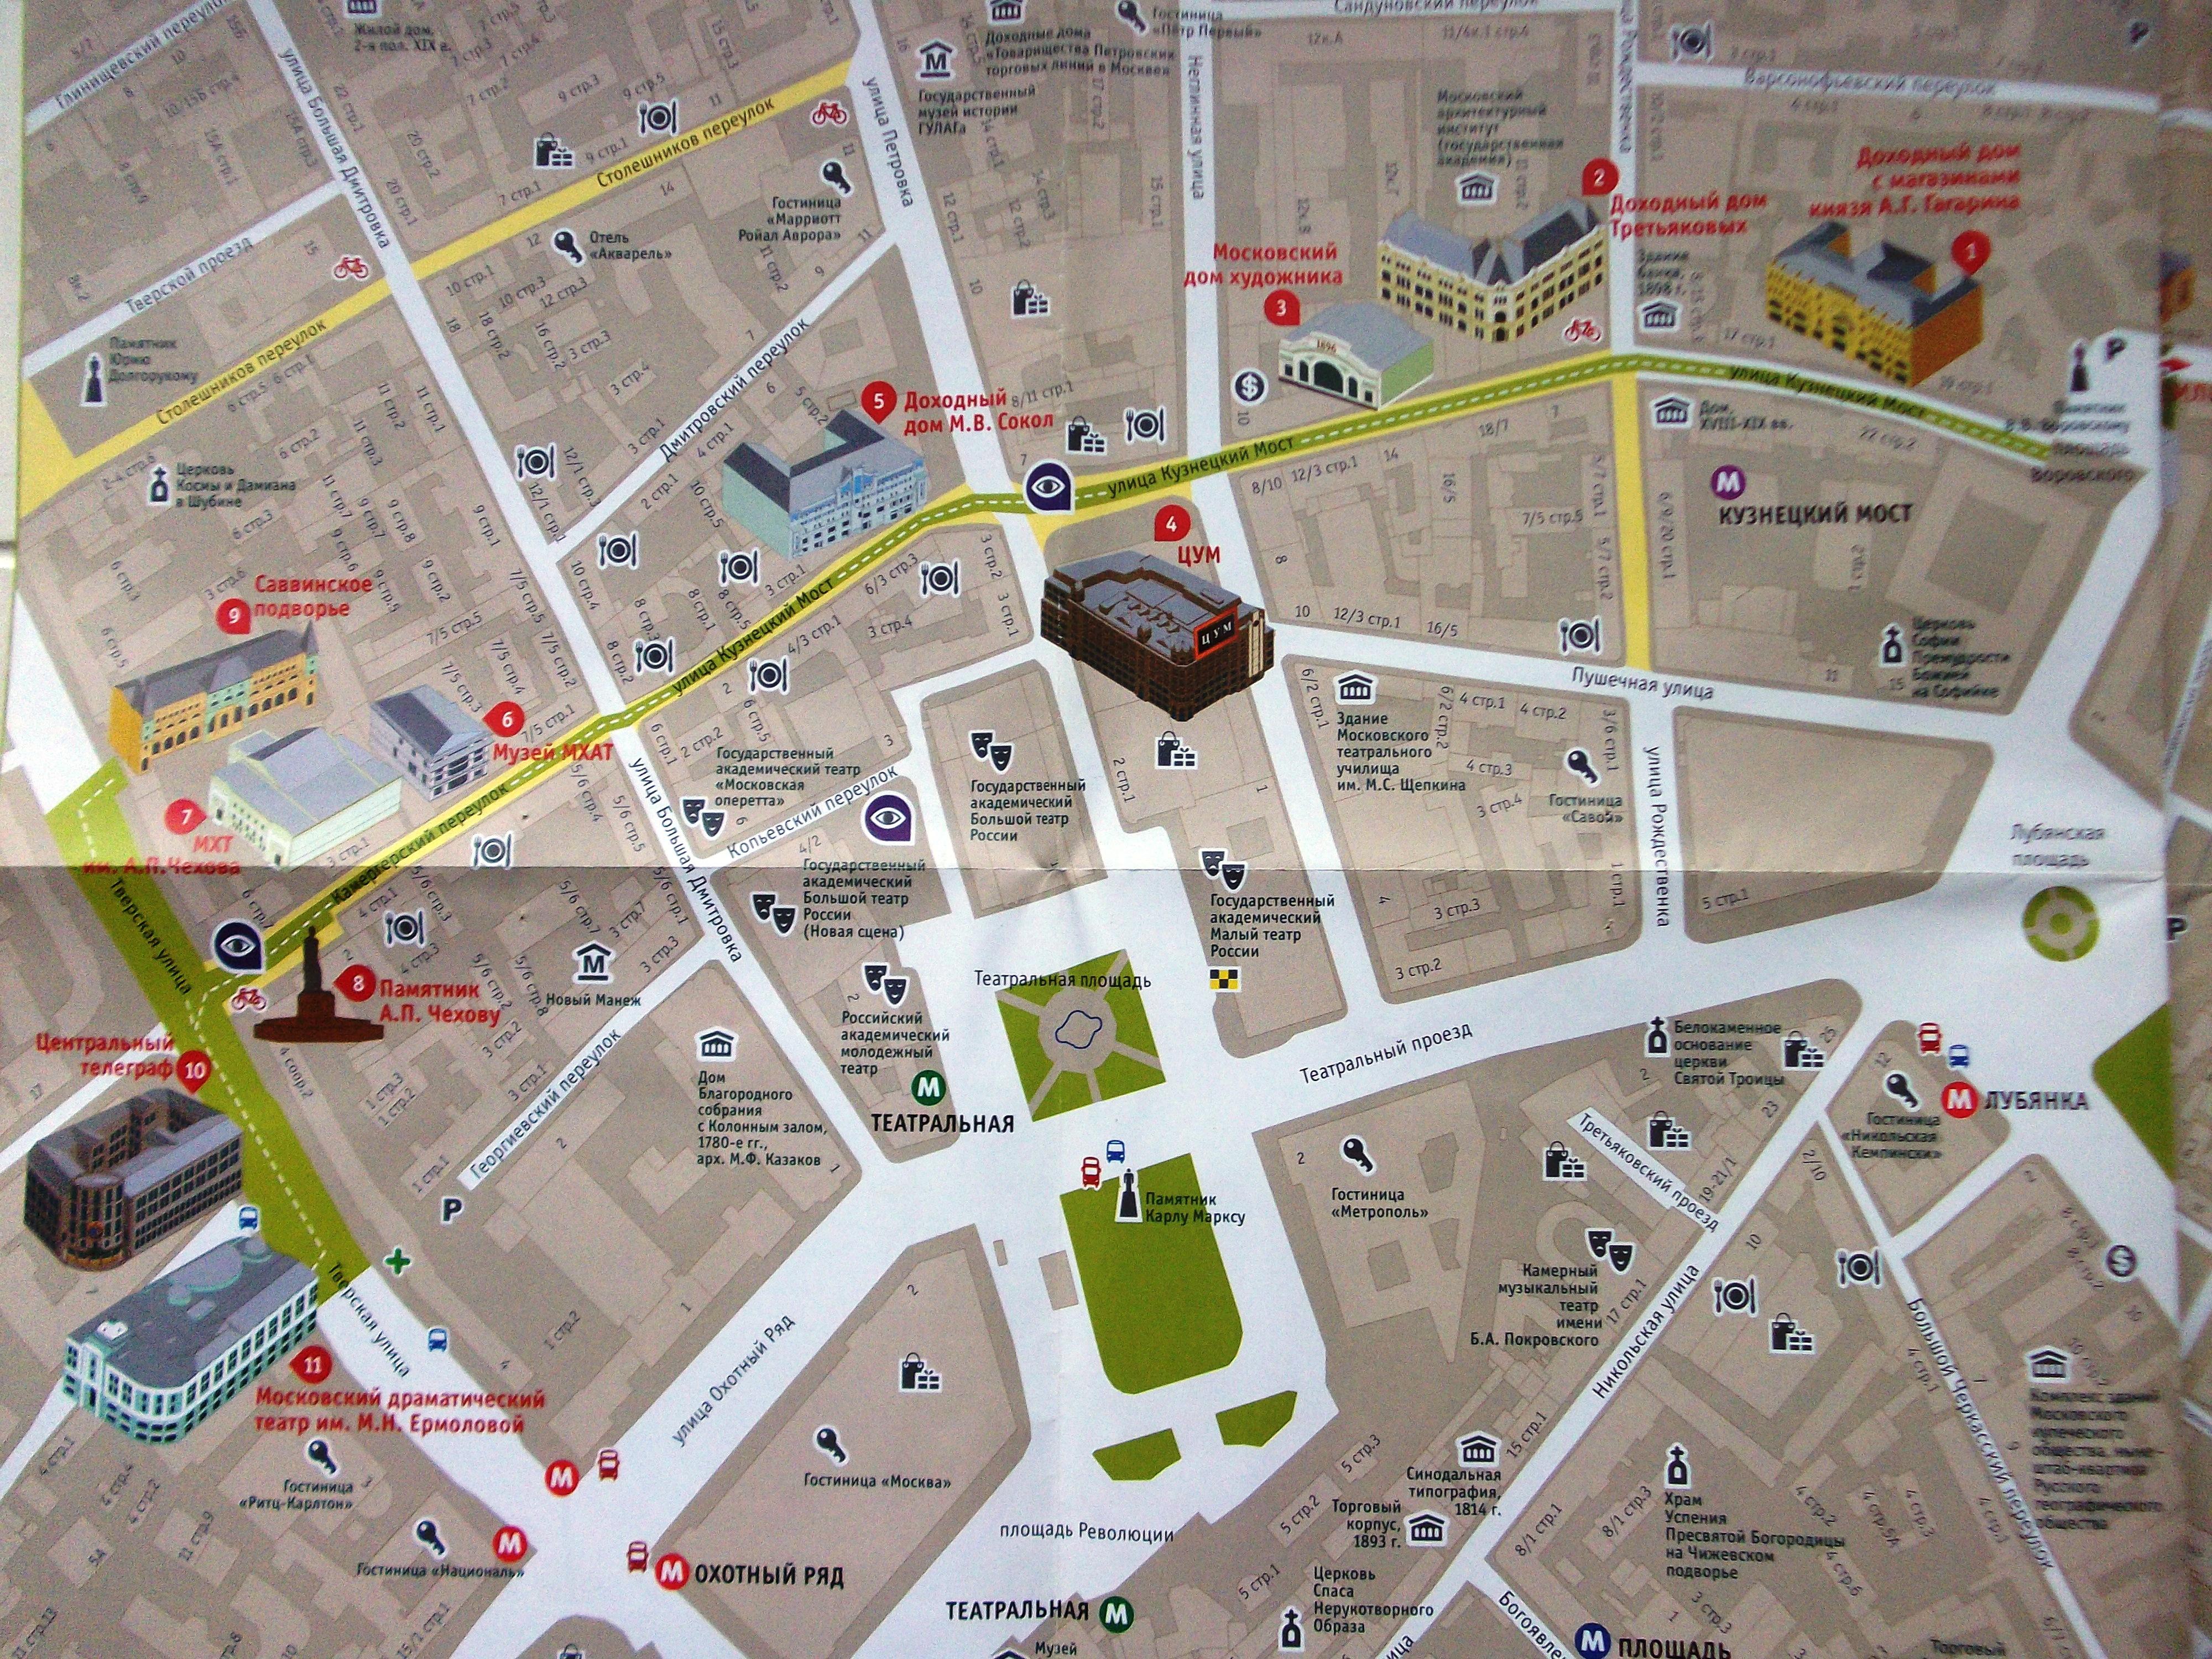 Екатеринбург - столица урала. - гид по путешествиям